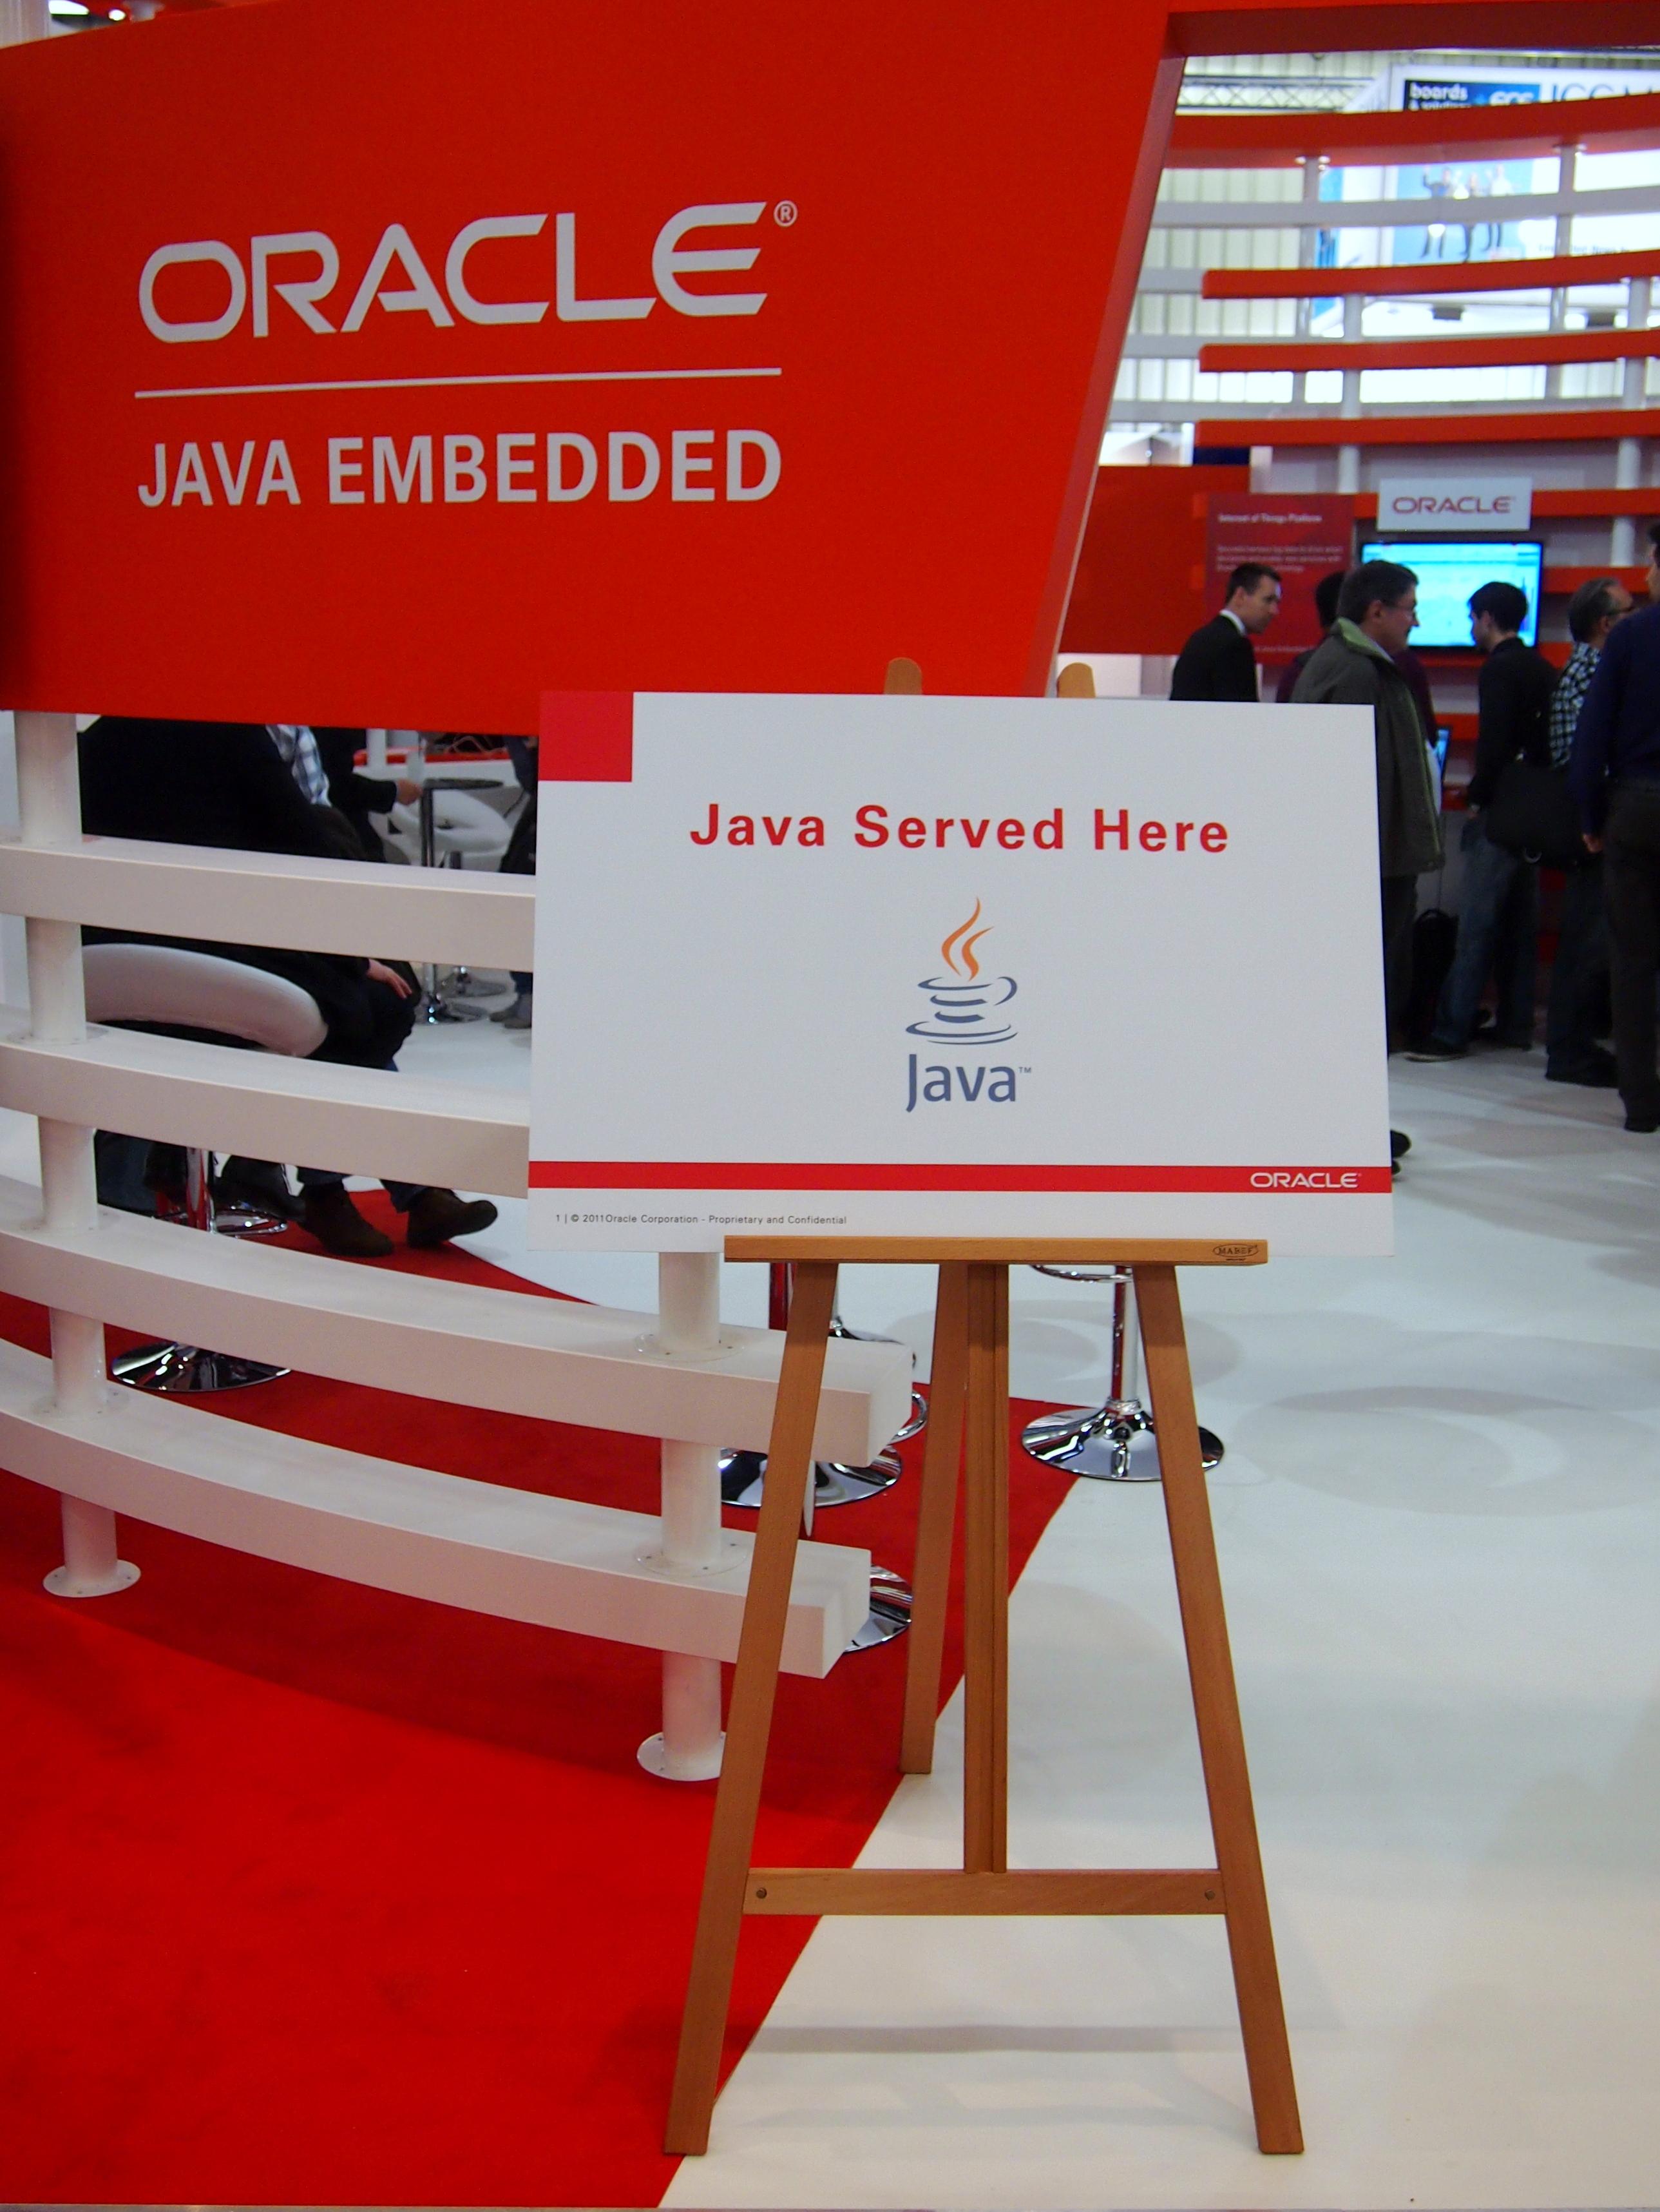 Embedded Java - Wikipedia